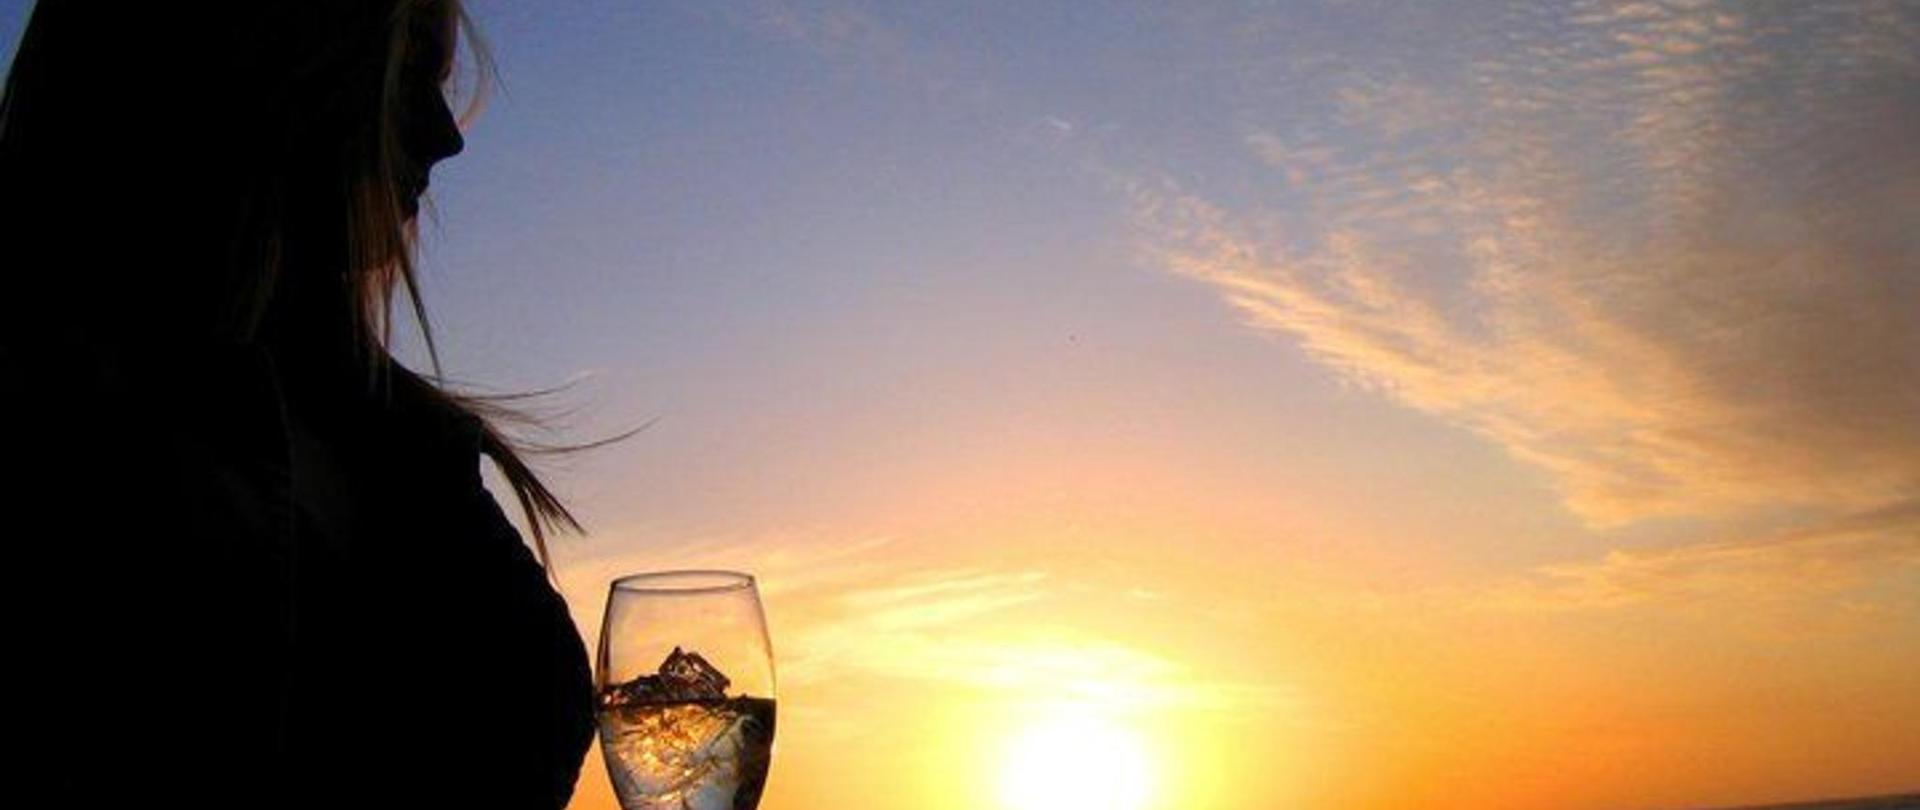 Beth sunset